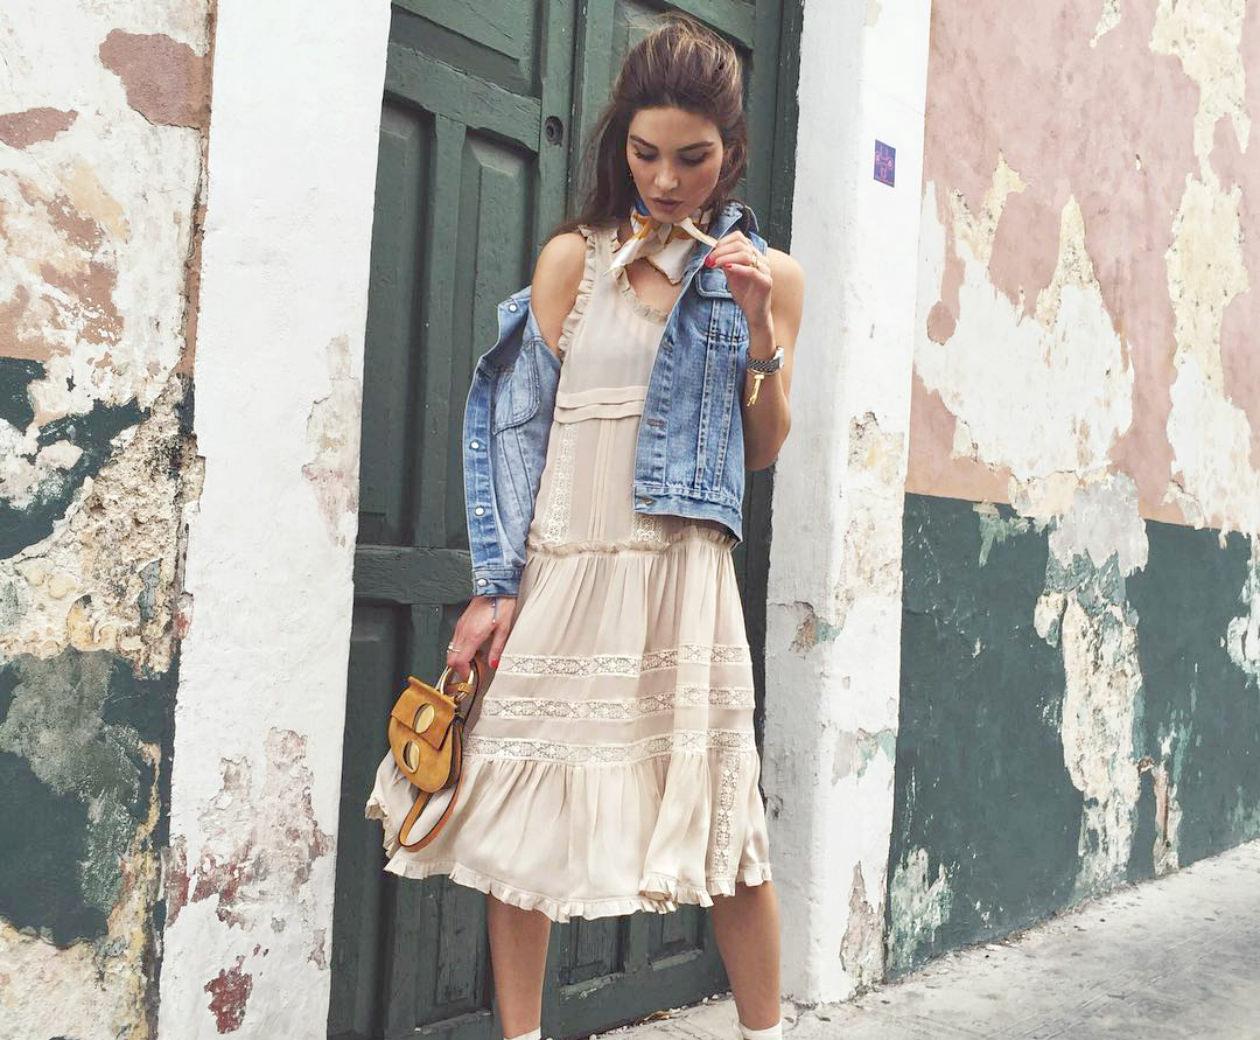 pfw-paris_fashion_week-spring_summer_2016-street_style-say_cheese-choe_dress-long-maxi-denim_jacket-veronika_heilbrunner-790x1185